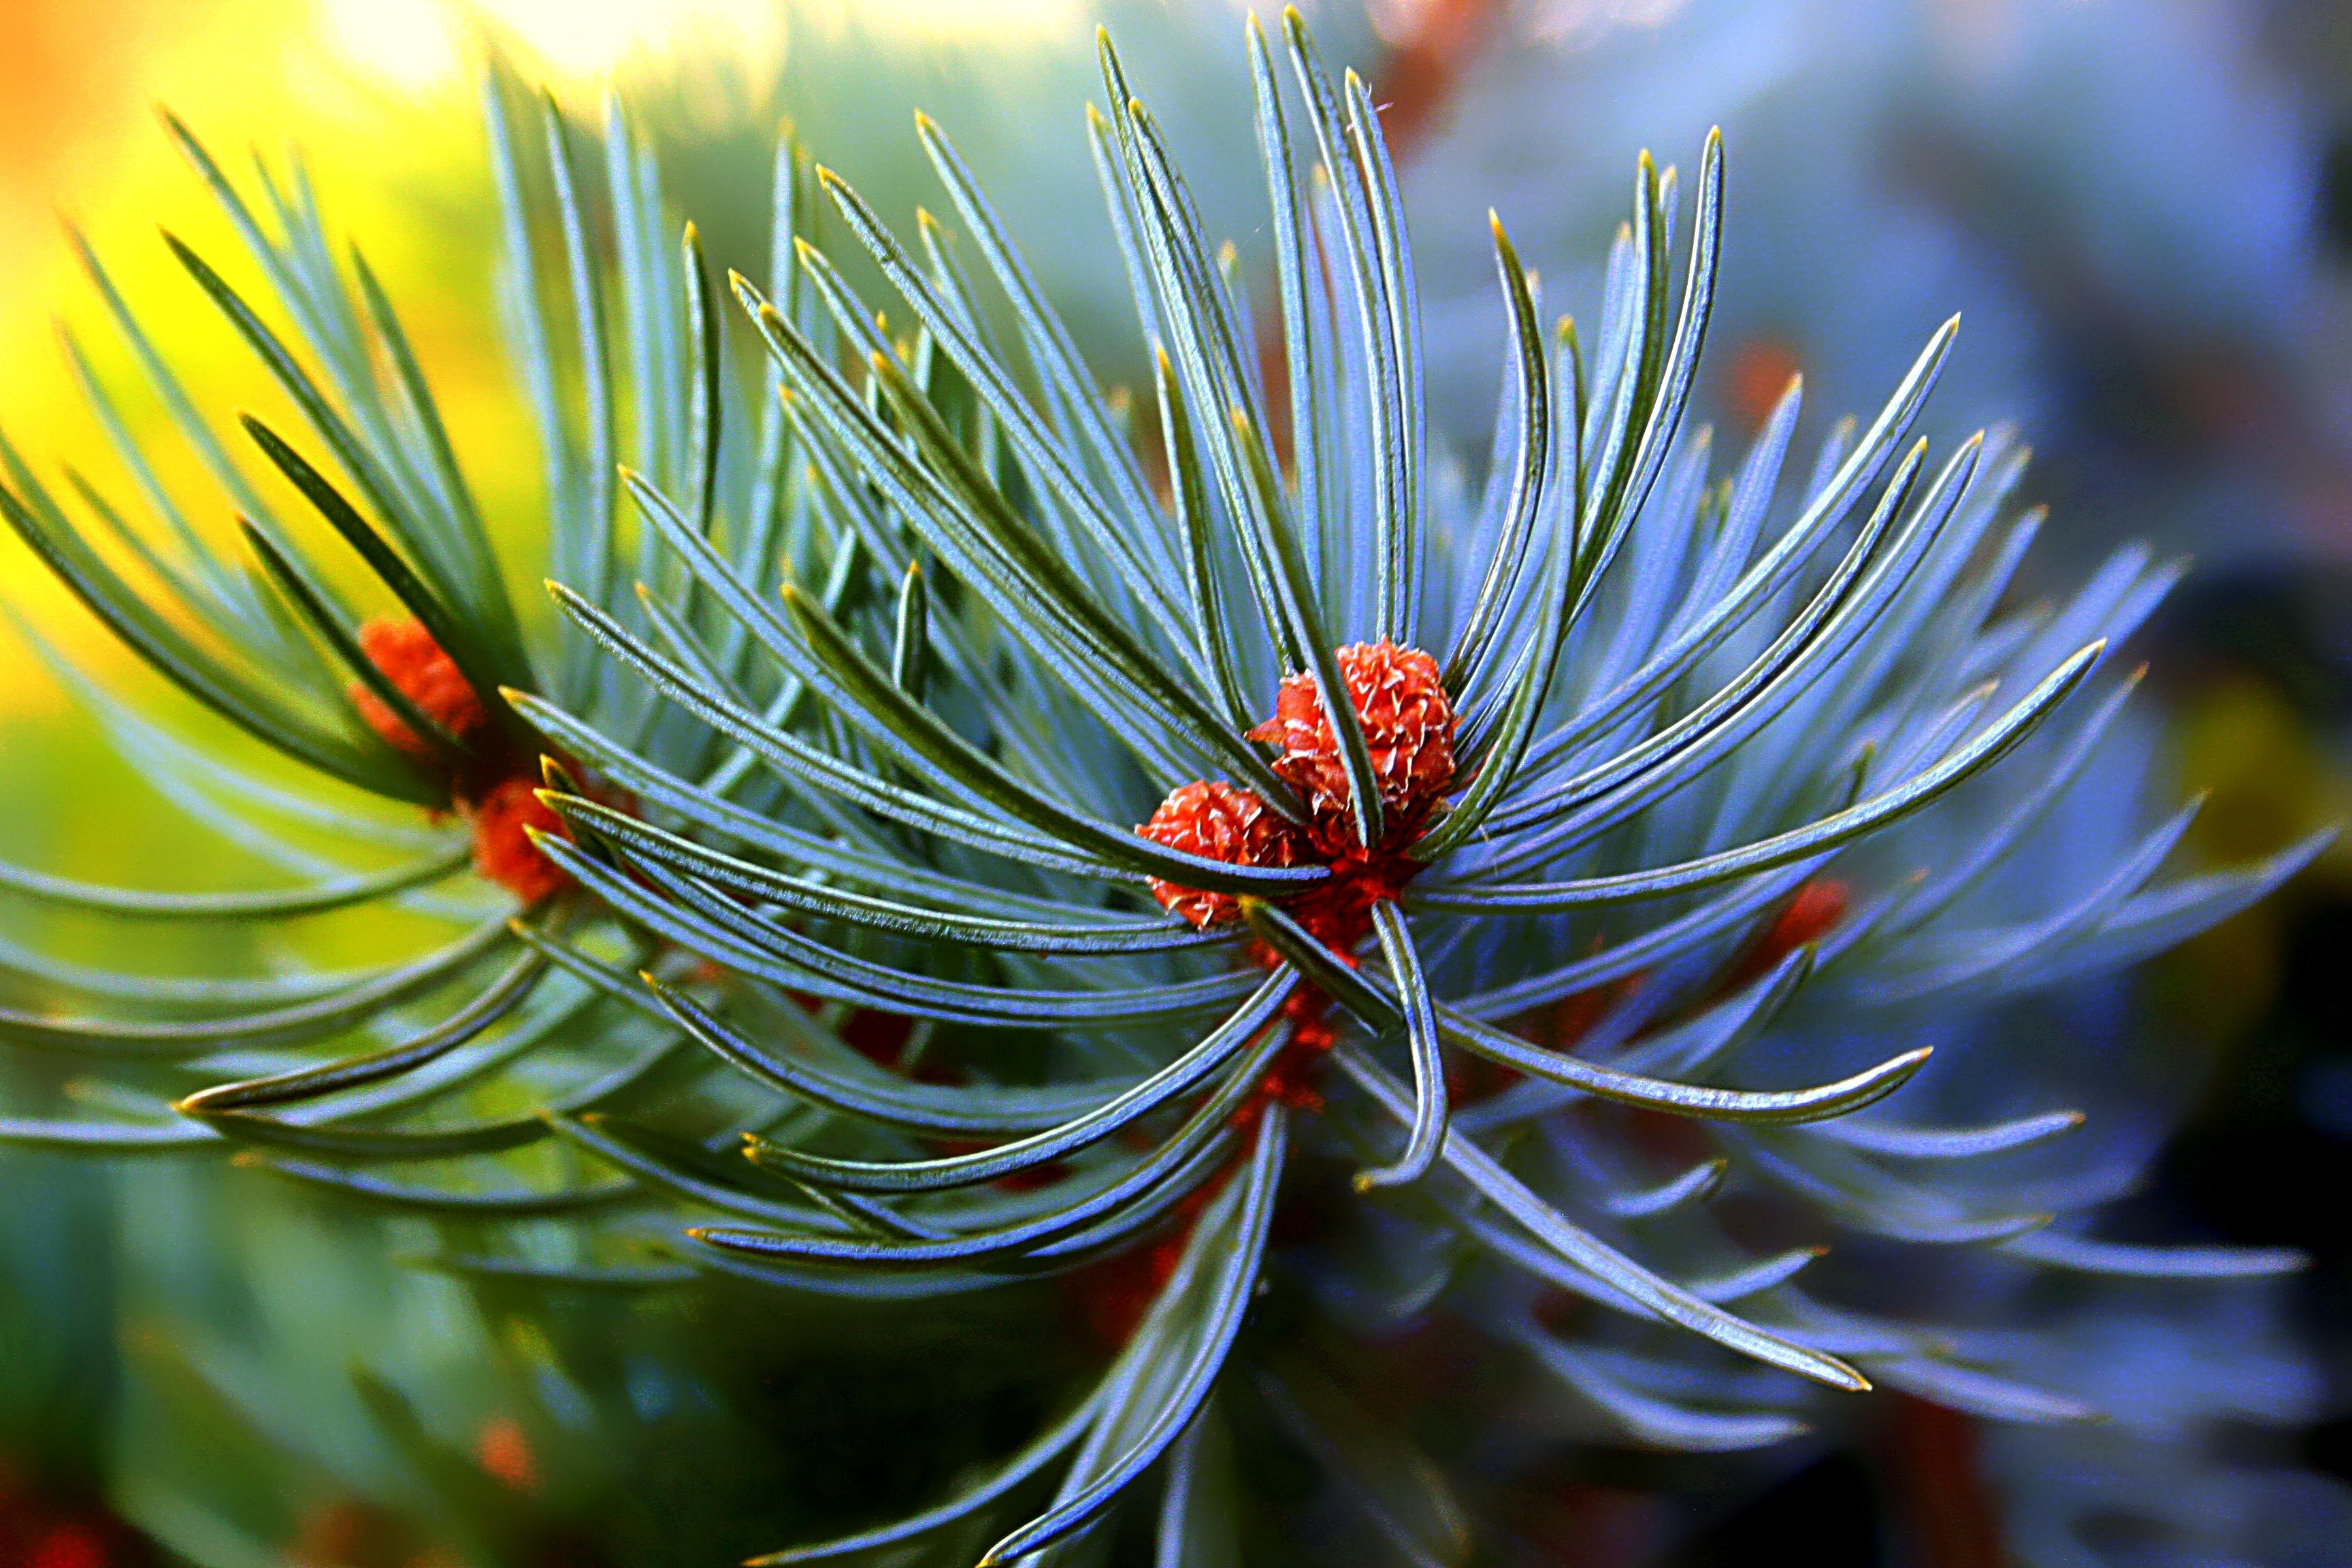 3456x2304,特寫,微距攝影,Pine needles,枝,大自然,